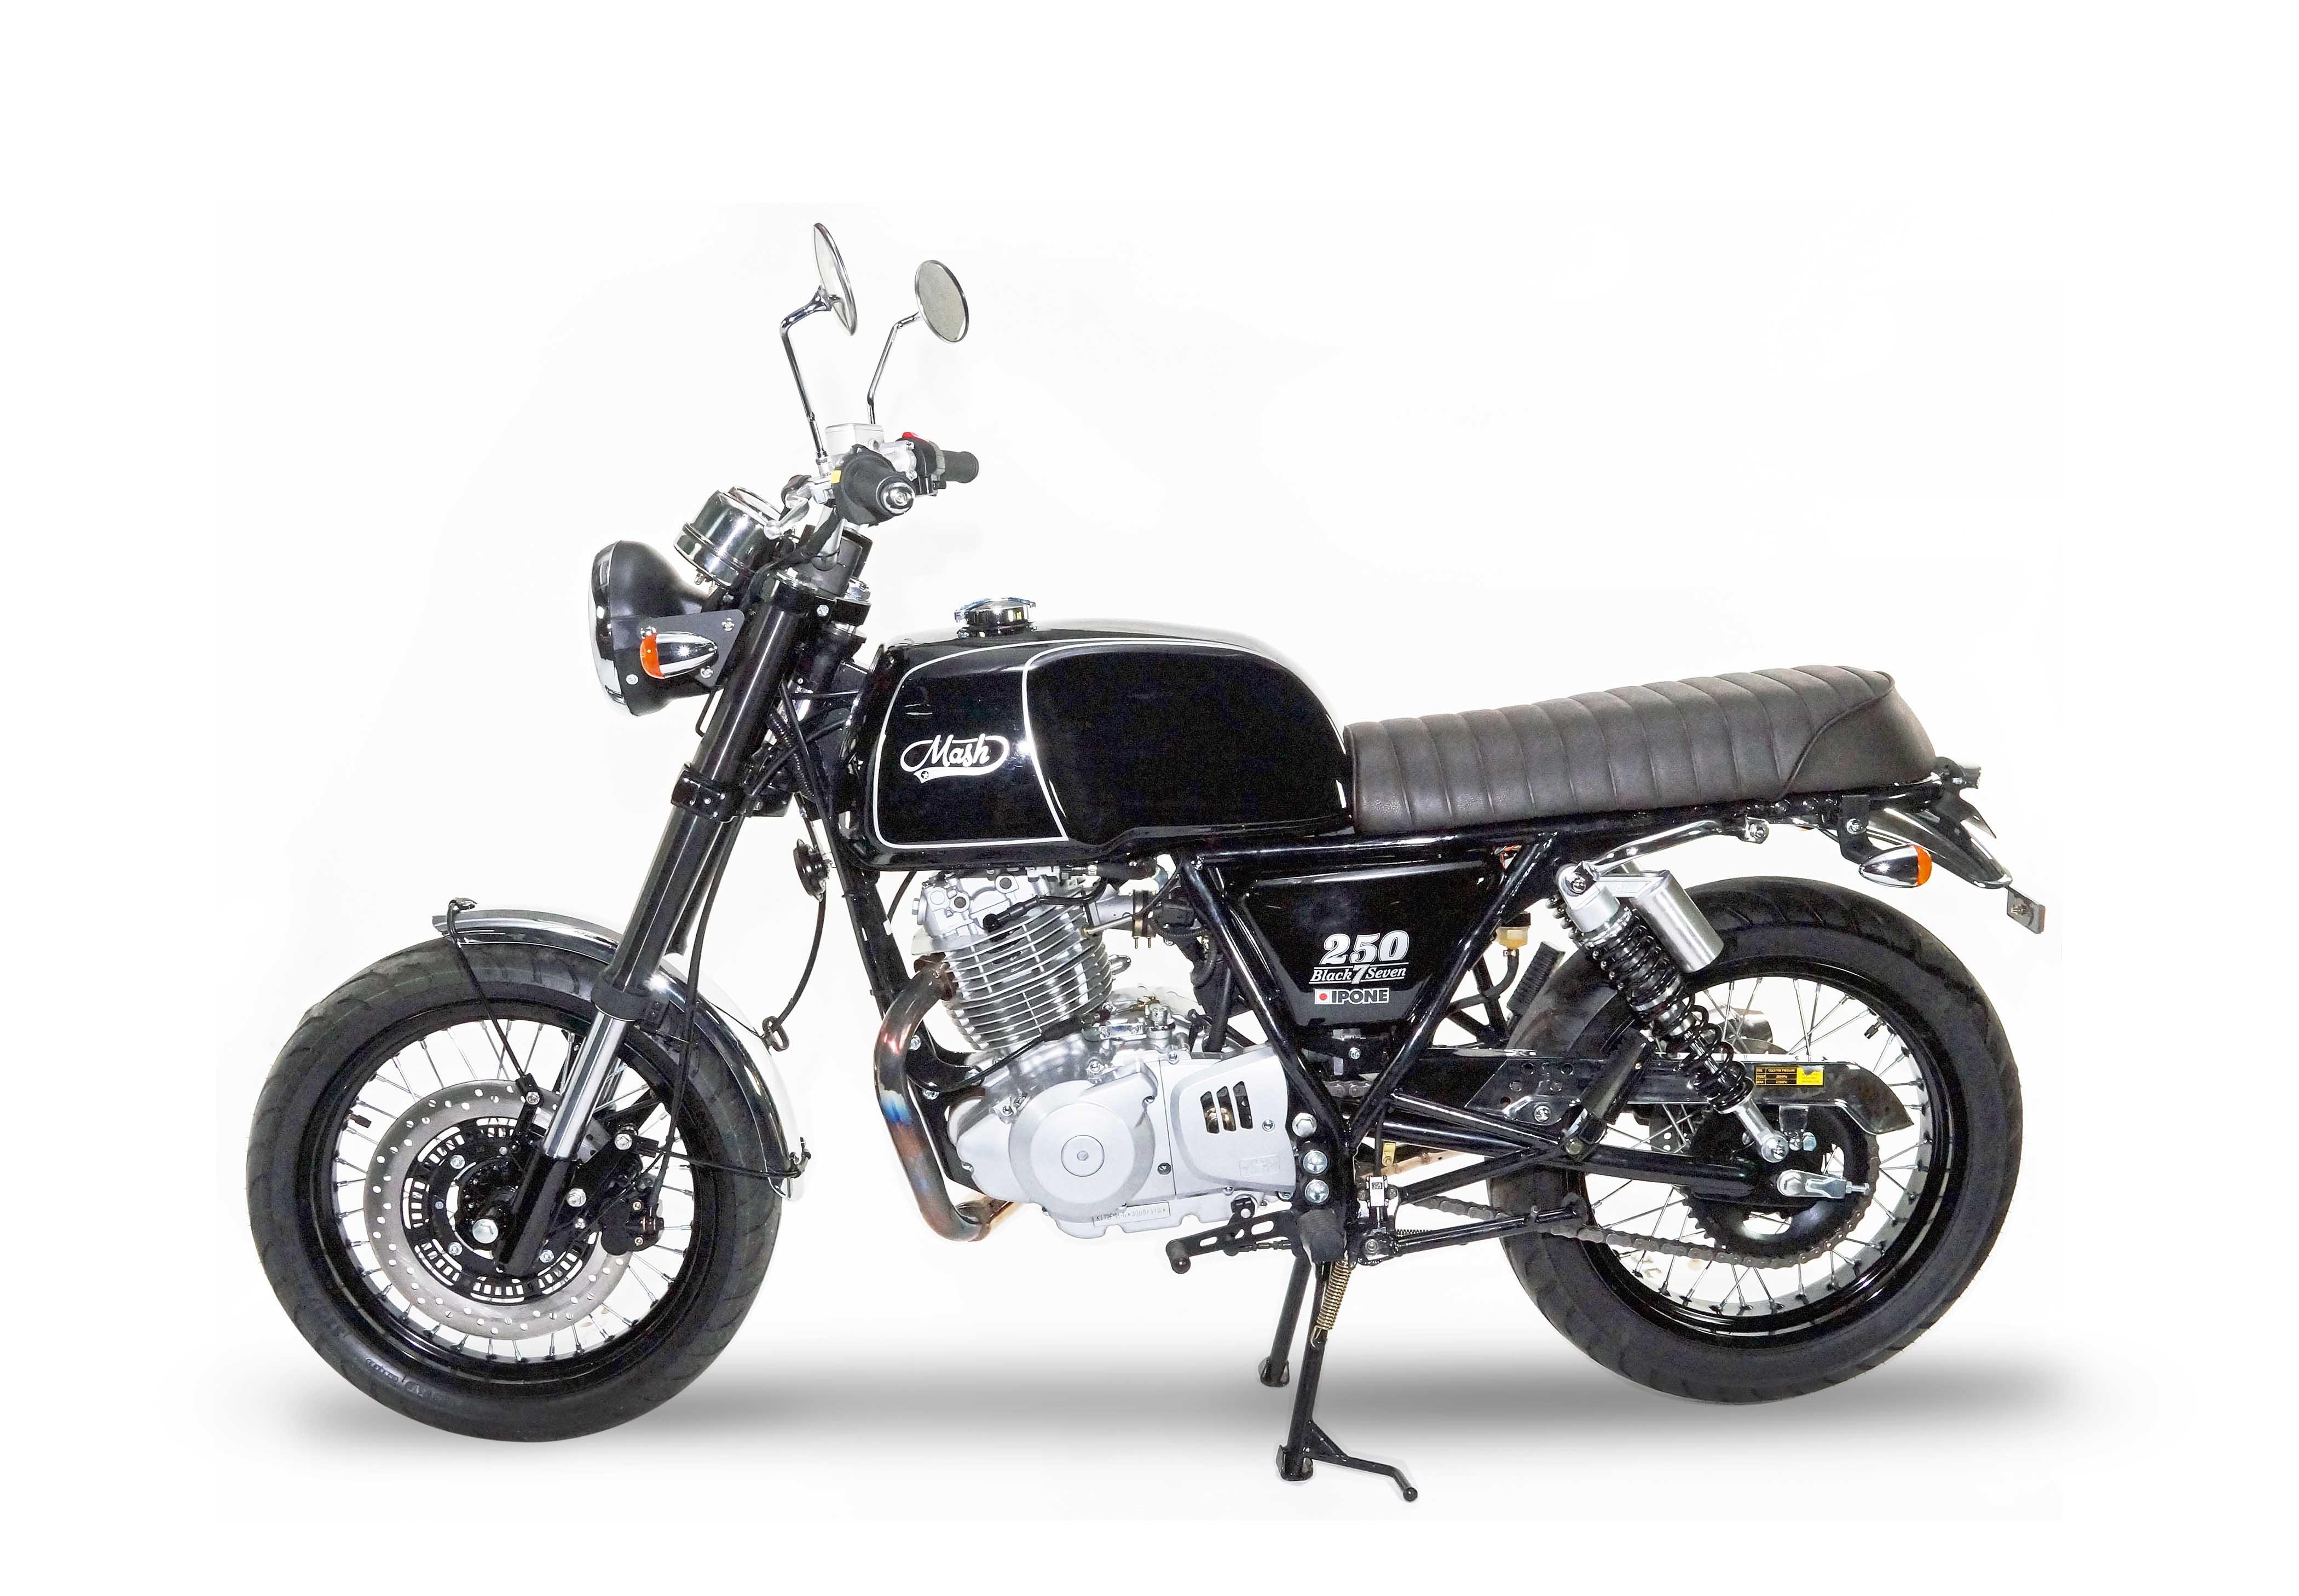 nouveaut moto 2017 mash lance la black seven 250. Black Bedroom Furniture Sets. Home Design Ideas